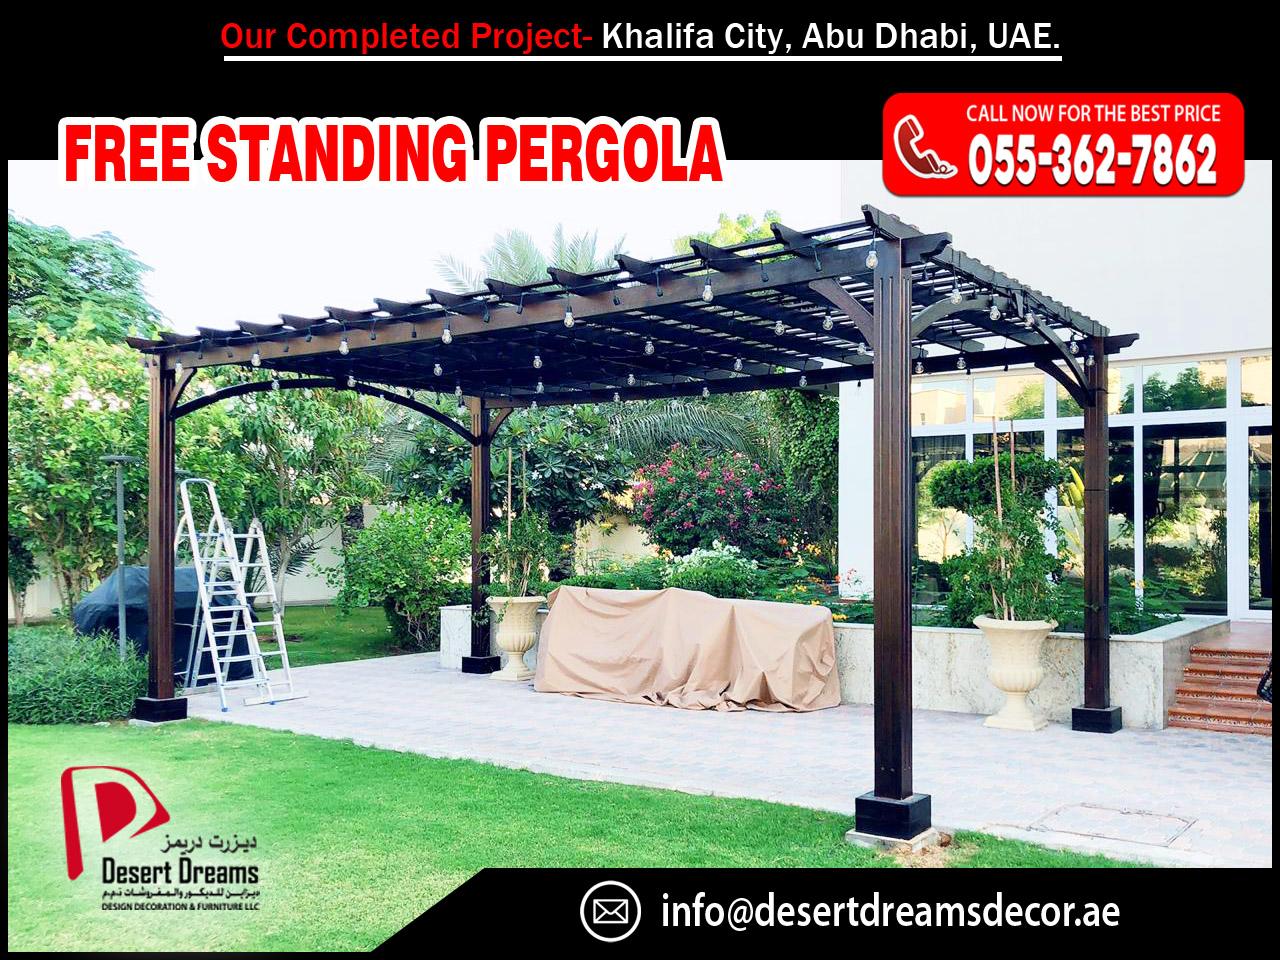 Free Standing Pergola in UAE.jpg